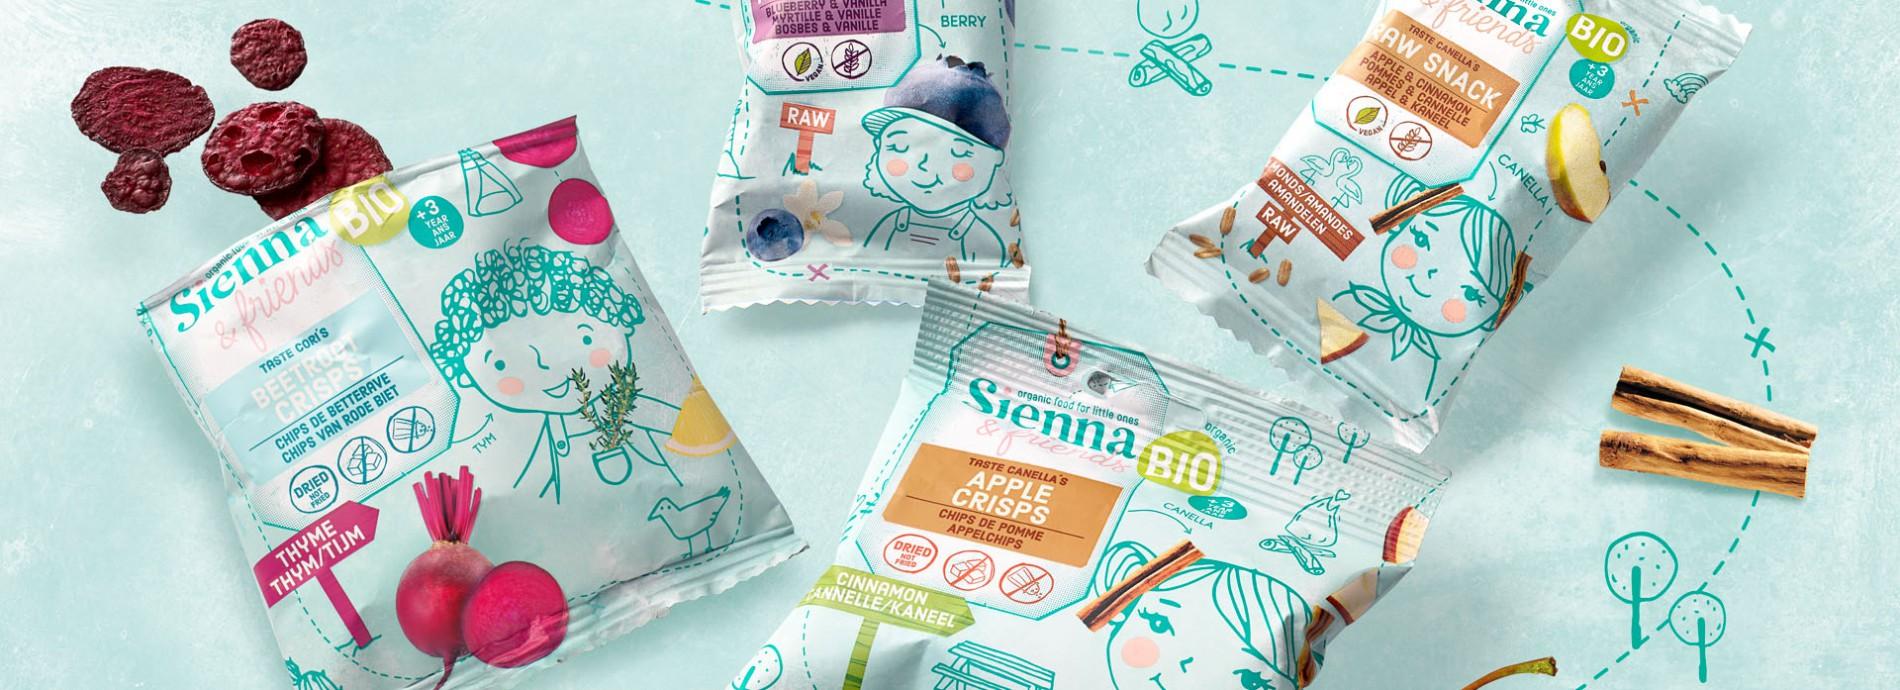 Quatre Mains package design - Package design sienna&friends, babyfood, quatremains, packaging